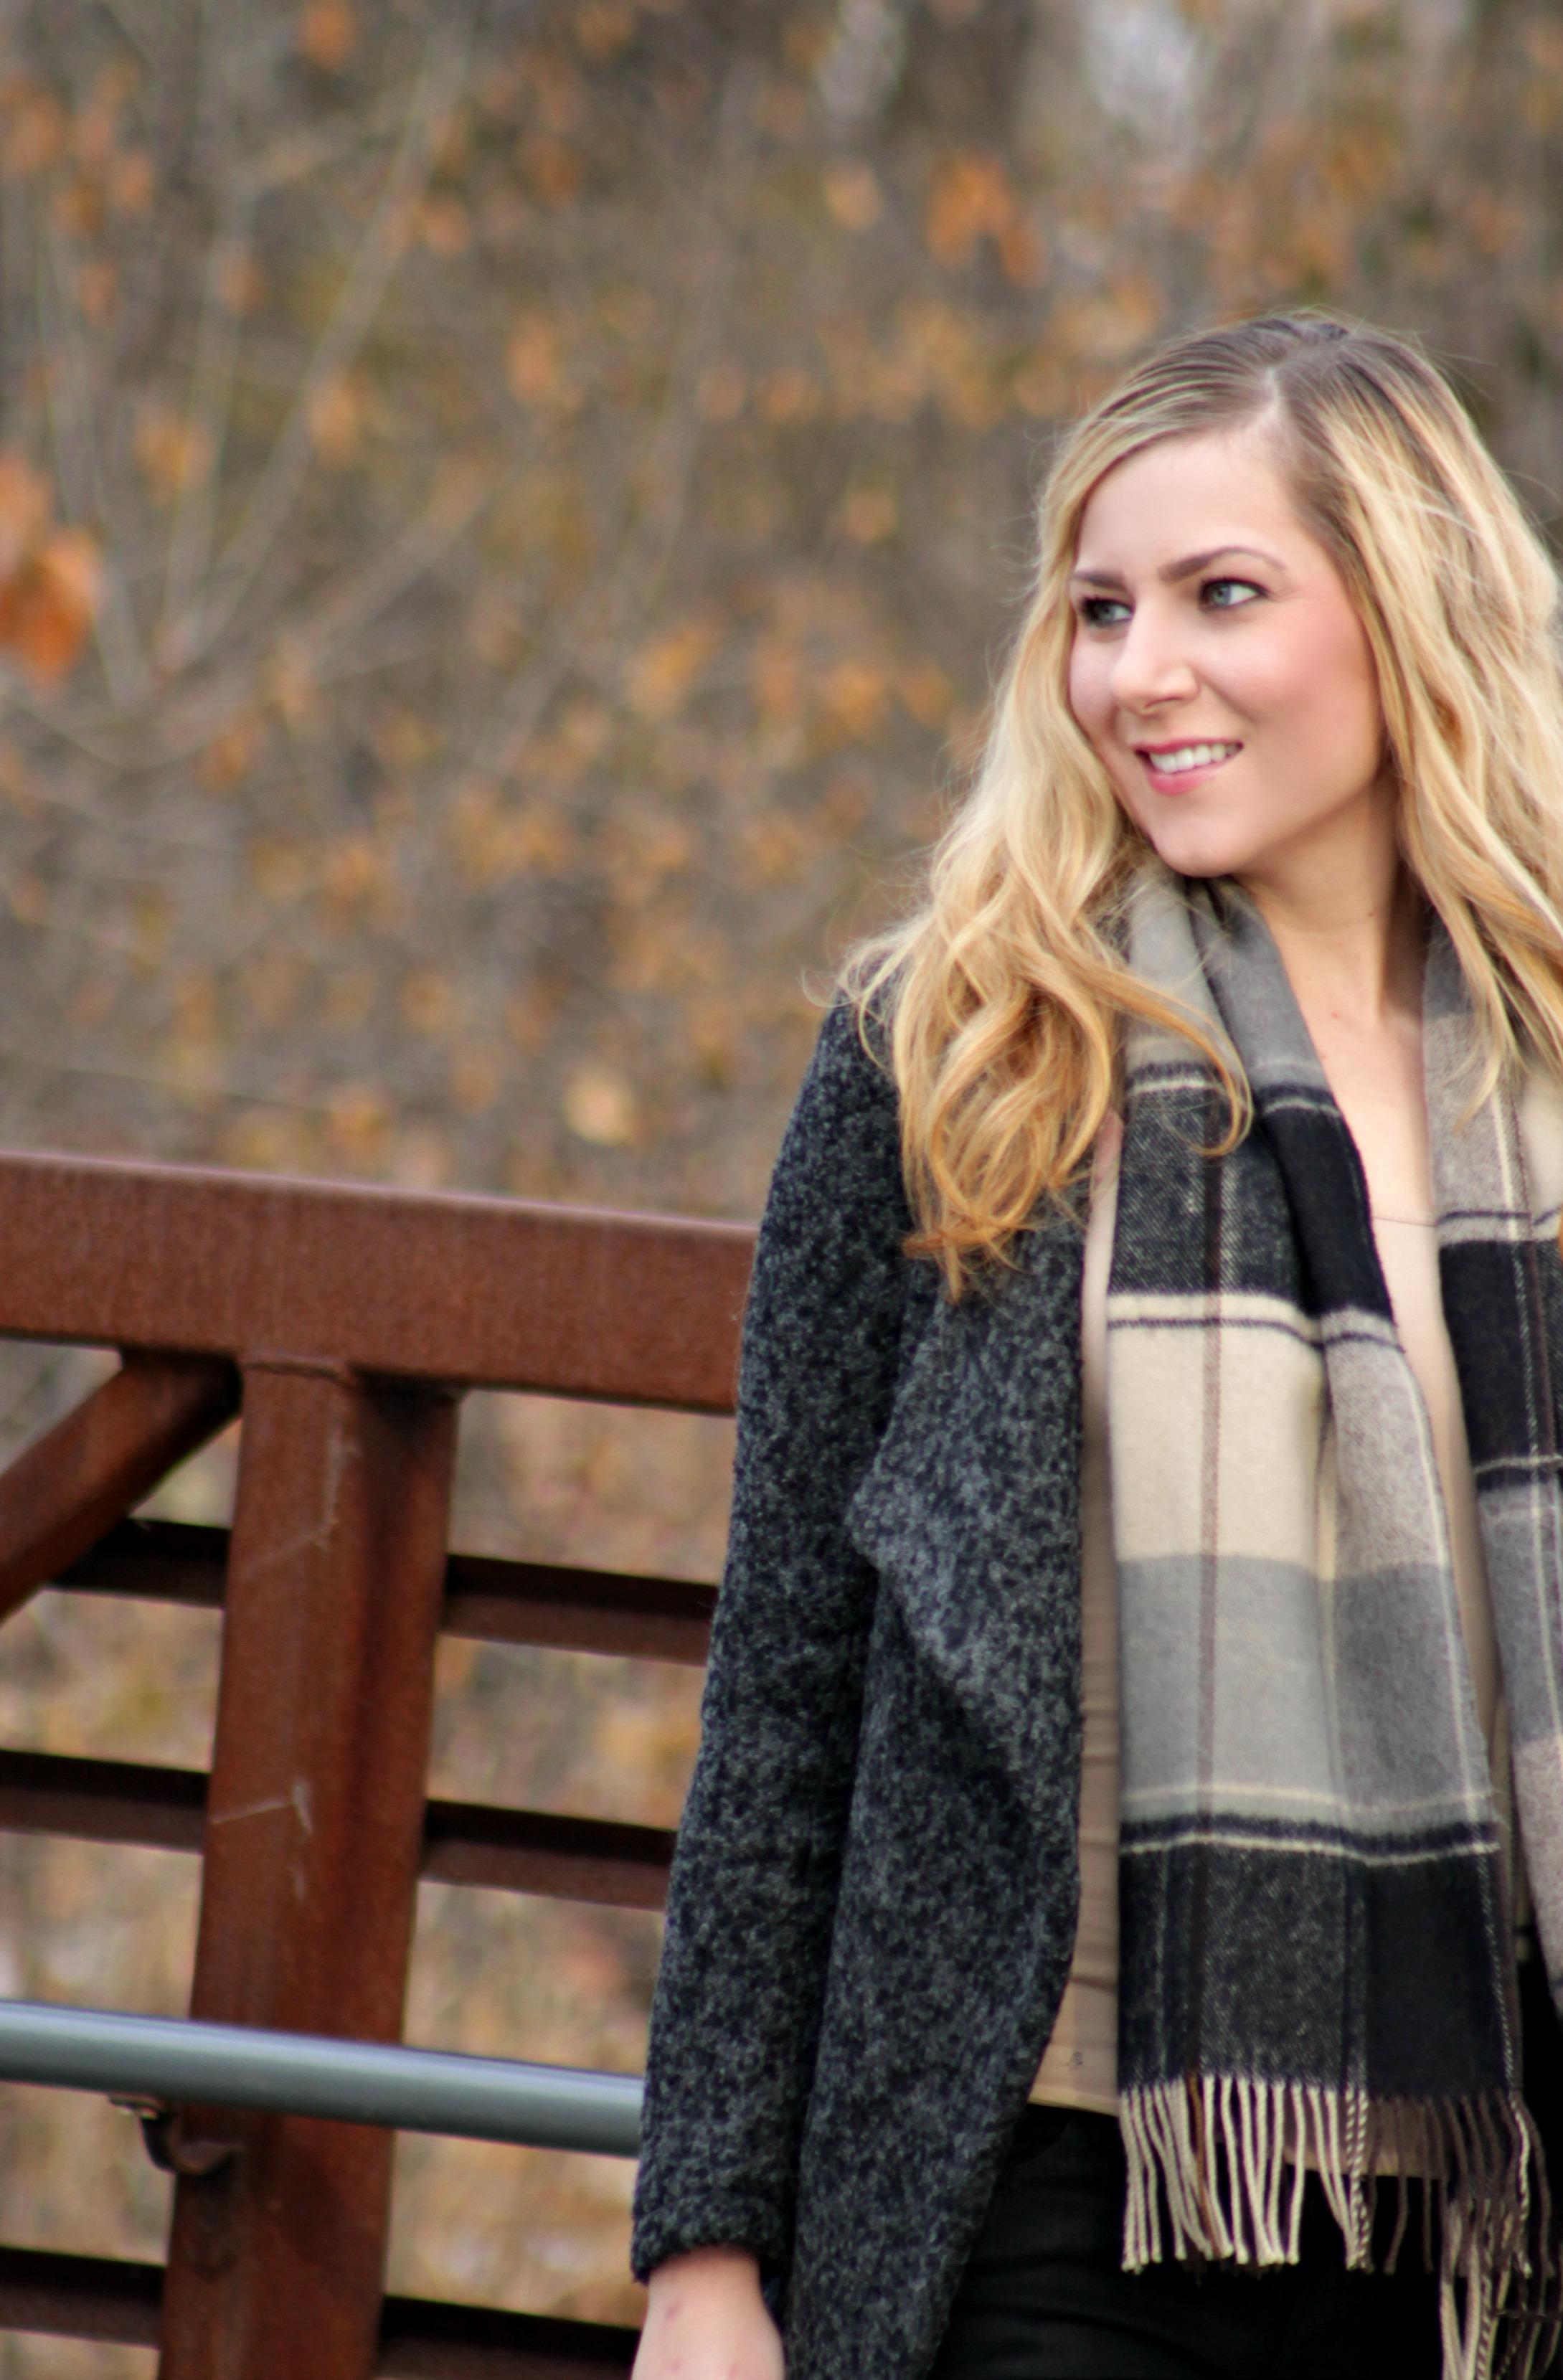 Winter Style tweed jacket, plaid scarf, tank top, coated denim